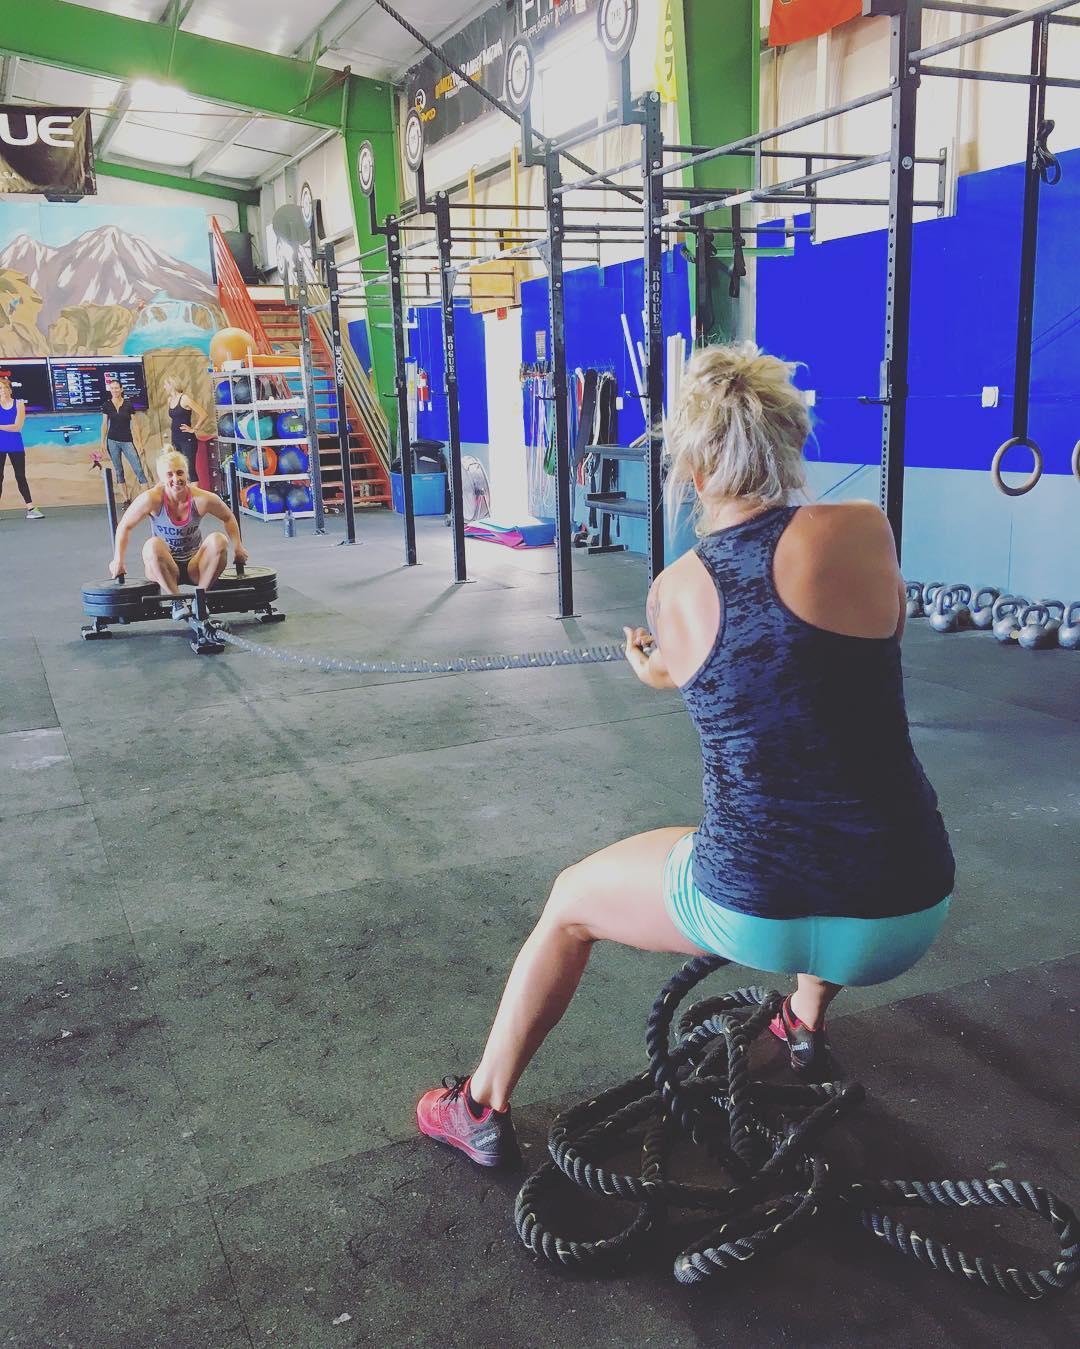 FRI-YAY! @caseyjorden16 is pulling for the weekend!  #teamwork #type44 #crossfit #reebok #sledpulls #inbend #fitness